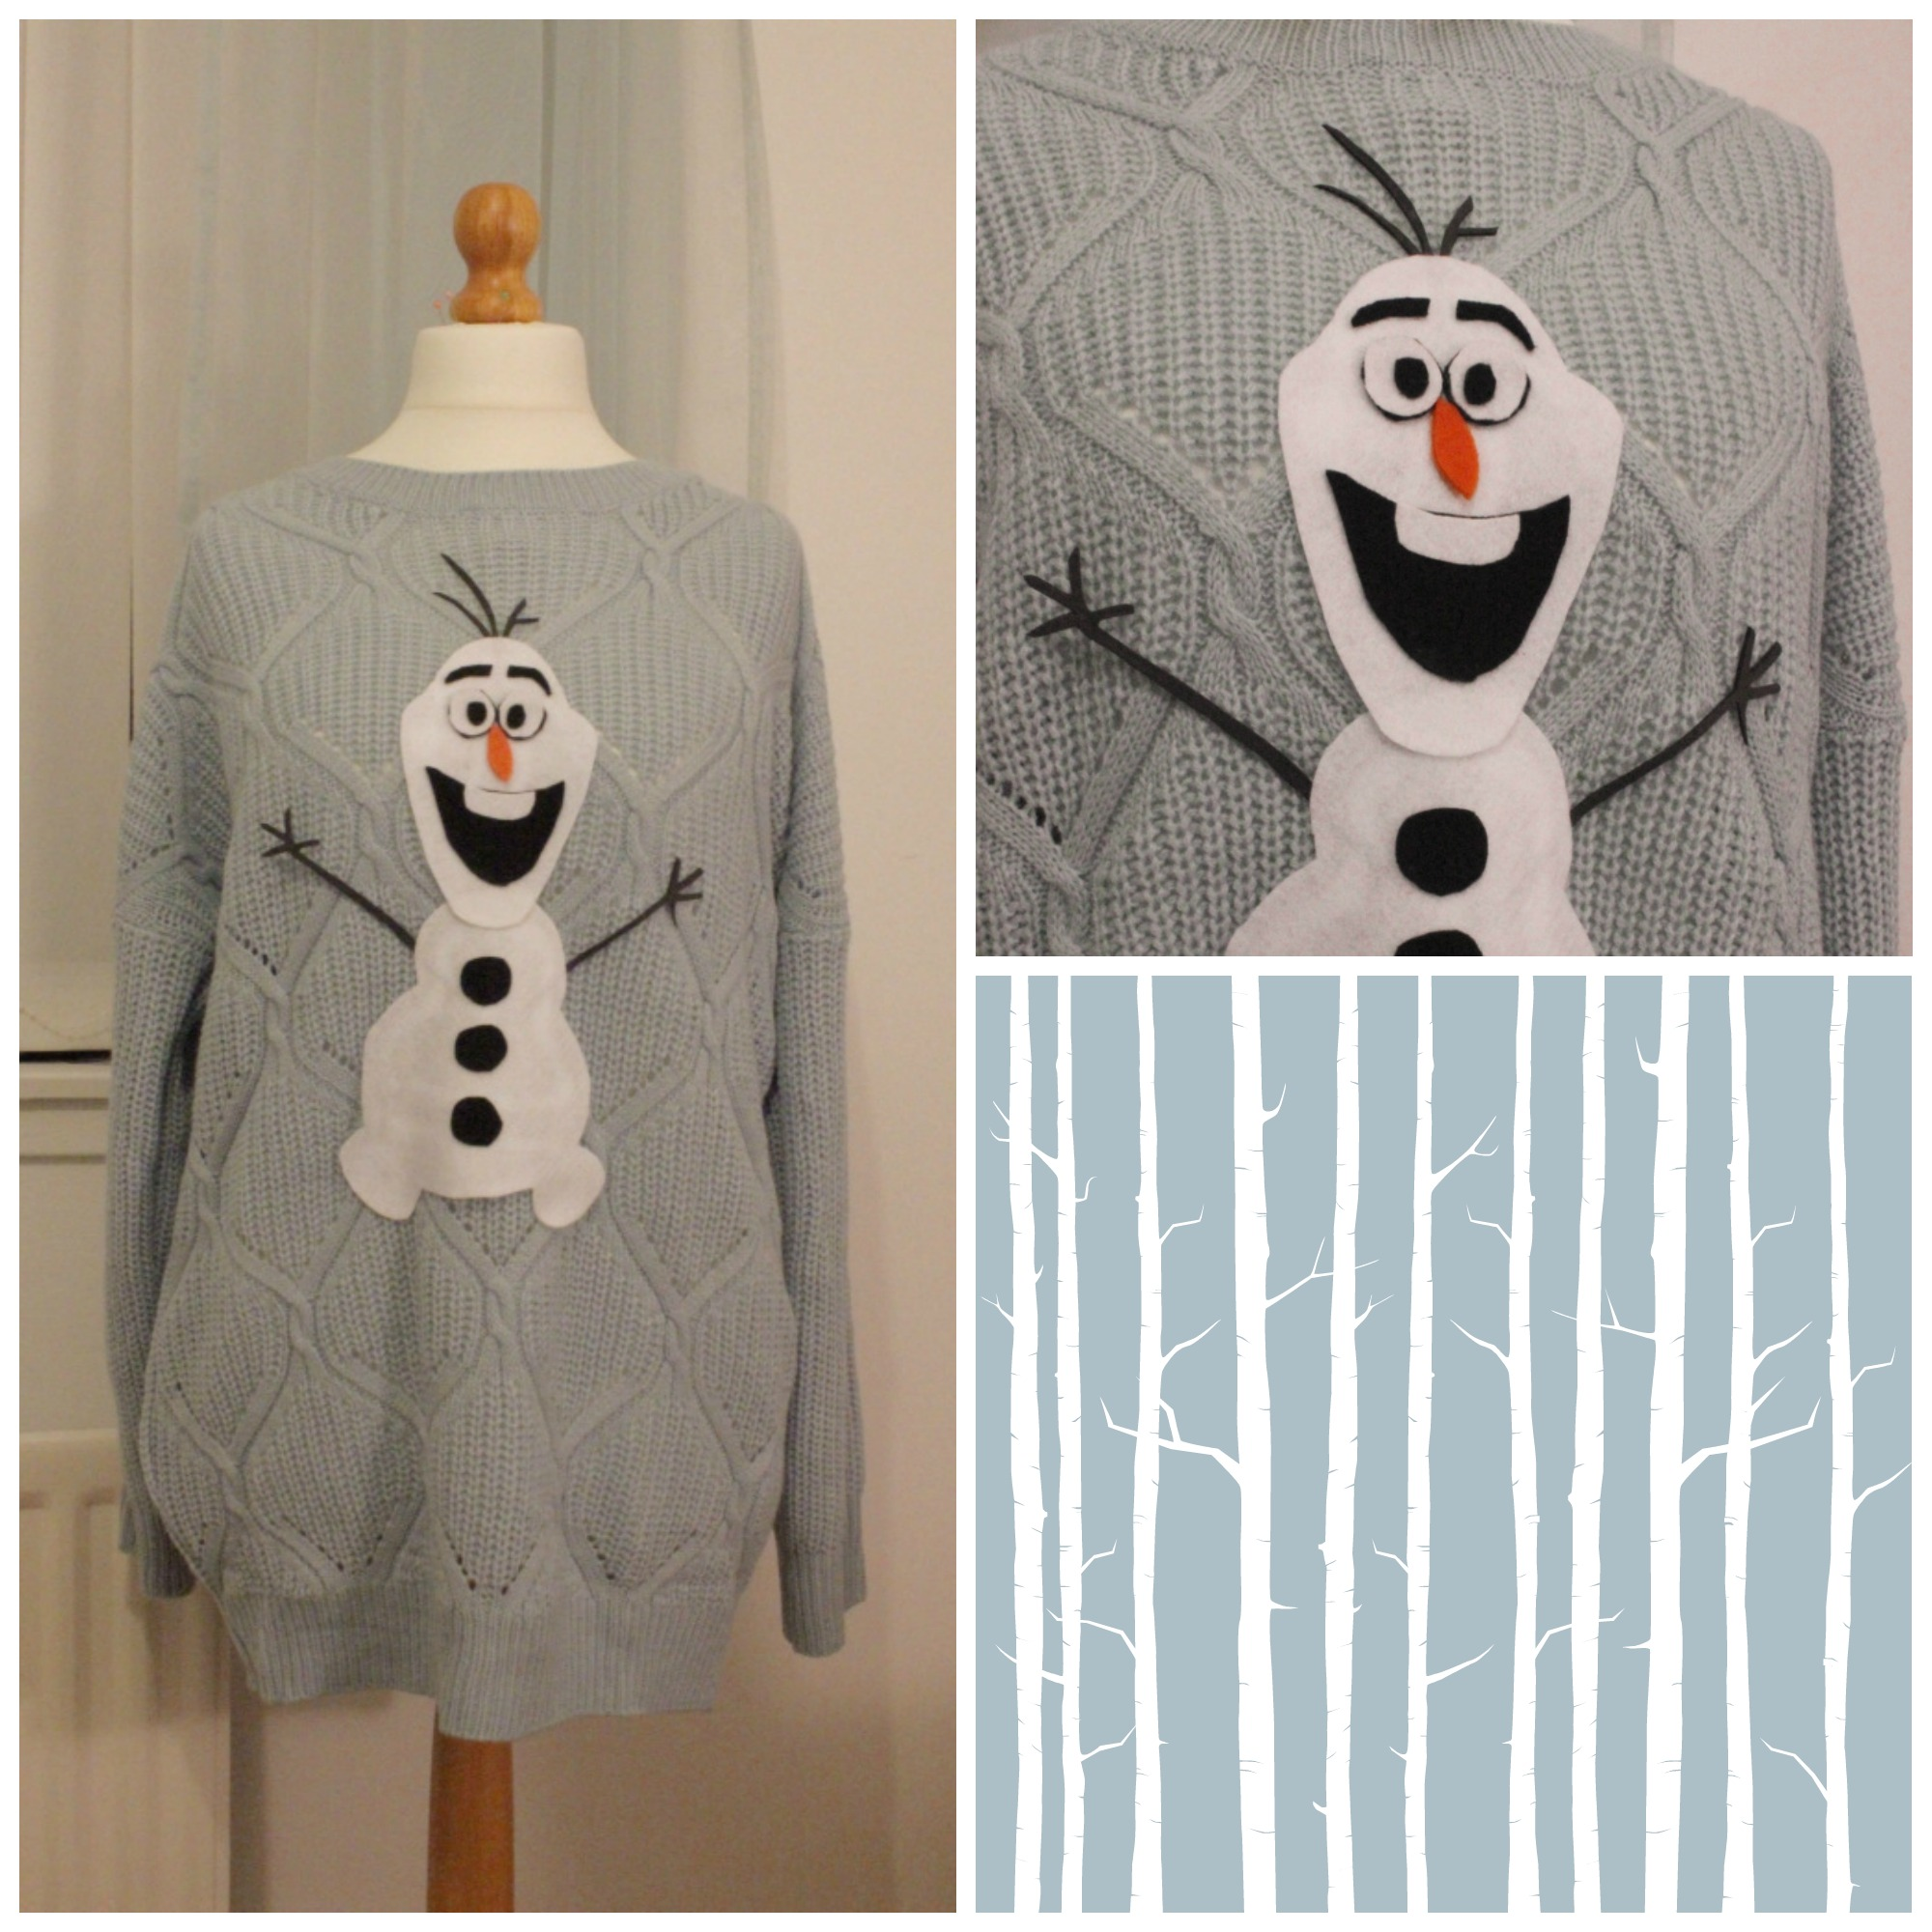 Olaf Christmas Jumper Knitting Pattern : Olaf From Frozen Knitting Patternjumper Joy Studio Design Gallery - Best De...